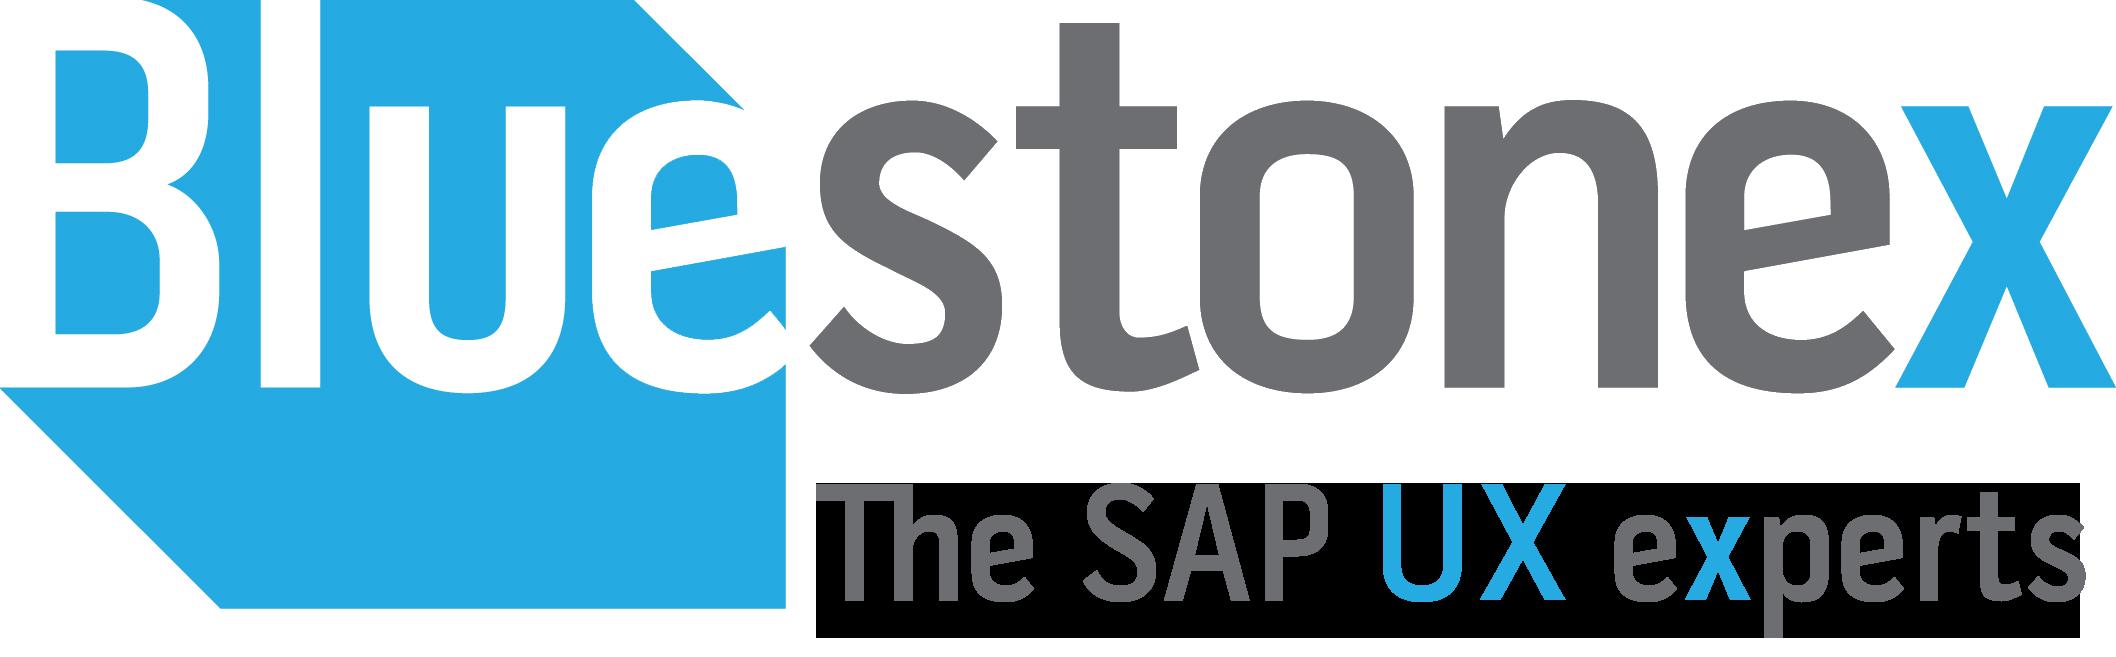 Bluestone X logo